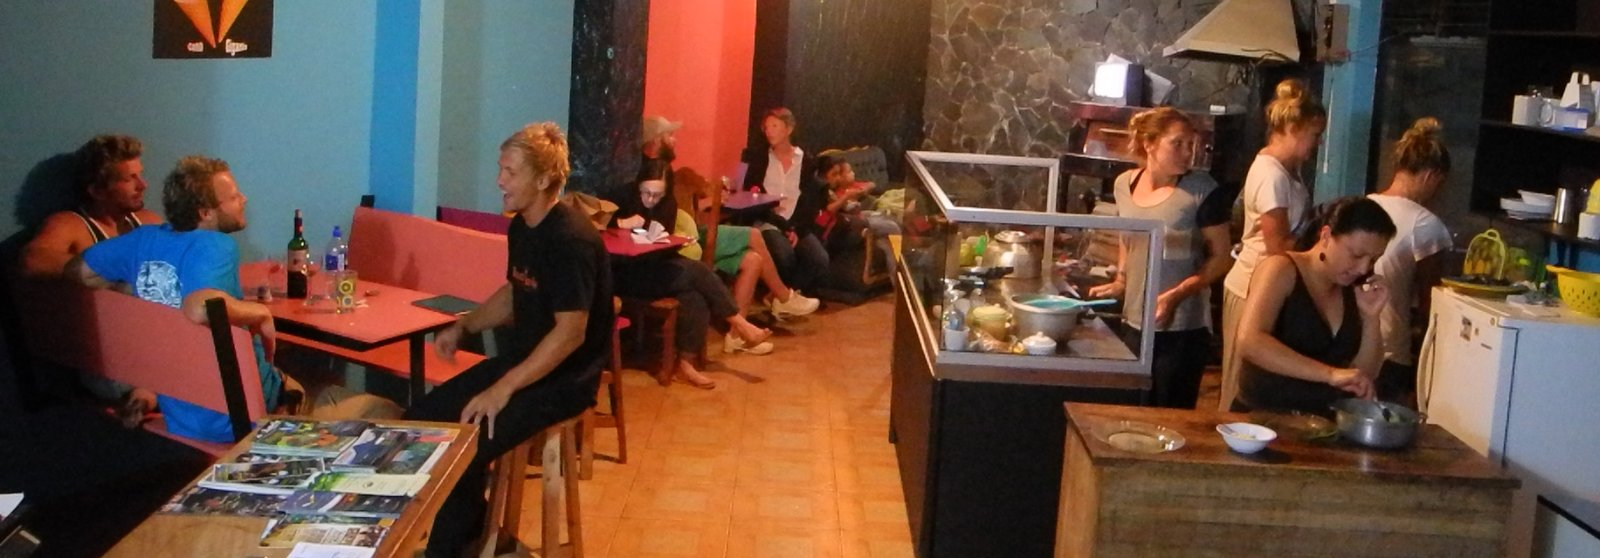 Sleepers Sleep Cheaper Hostel Monteverde Costa Rica